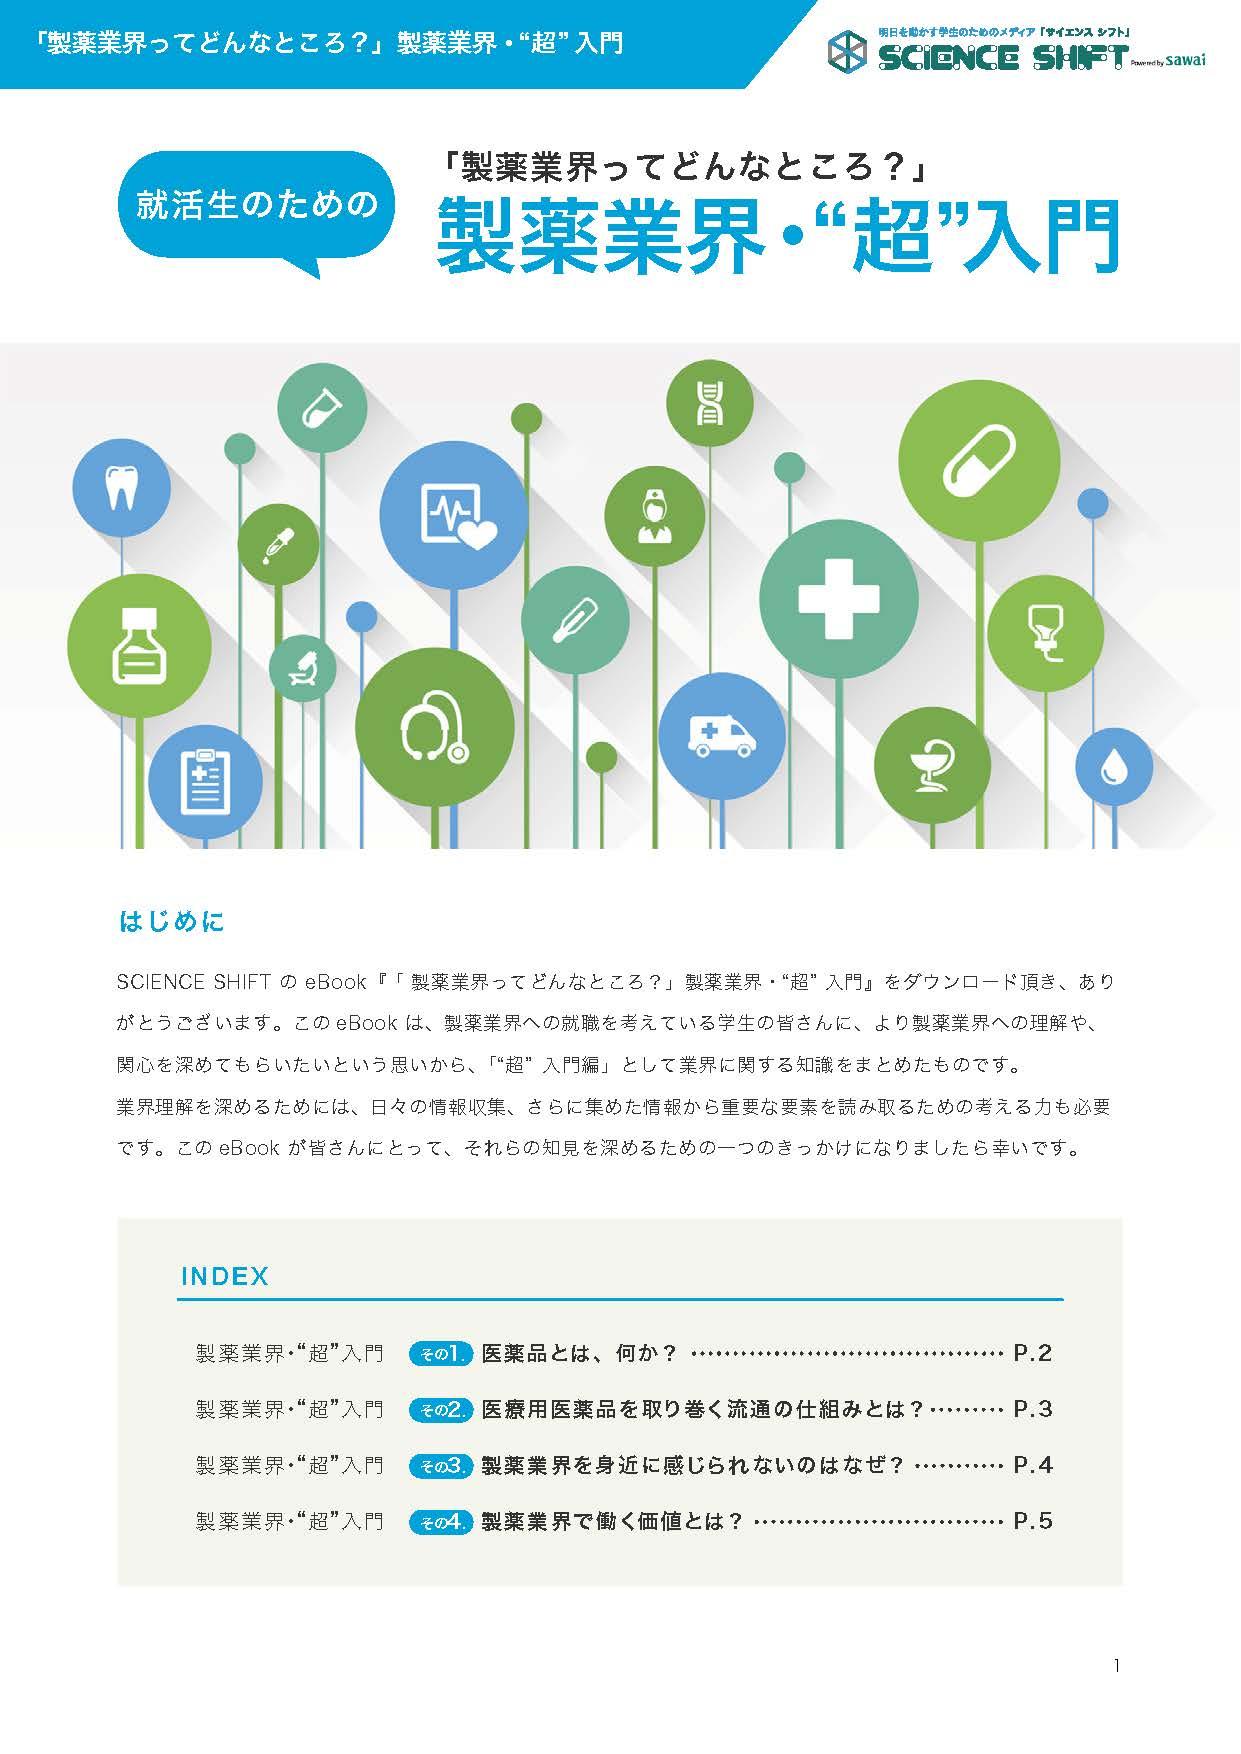 ebook-pharmaceutical-basis_ページ_1